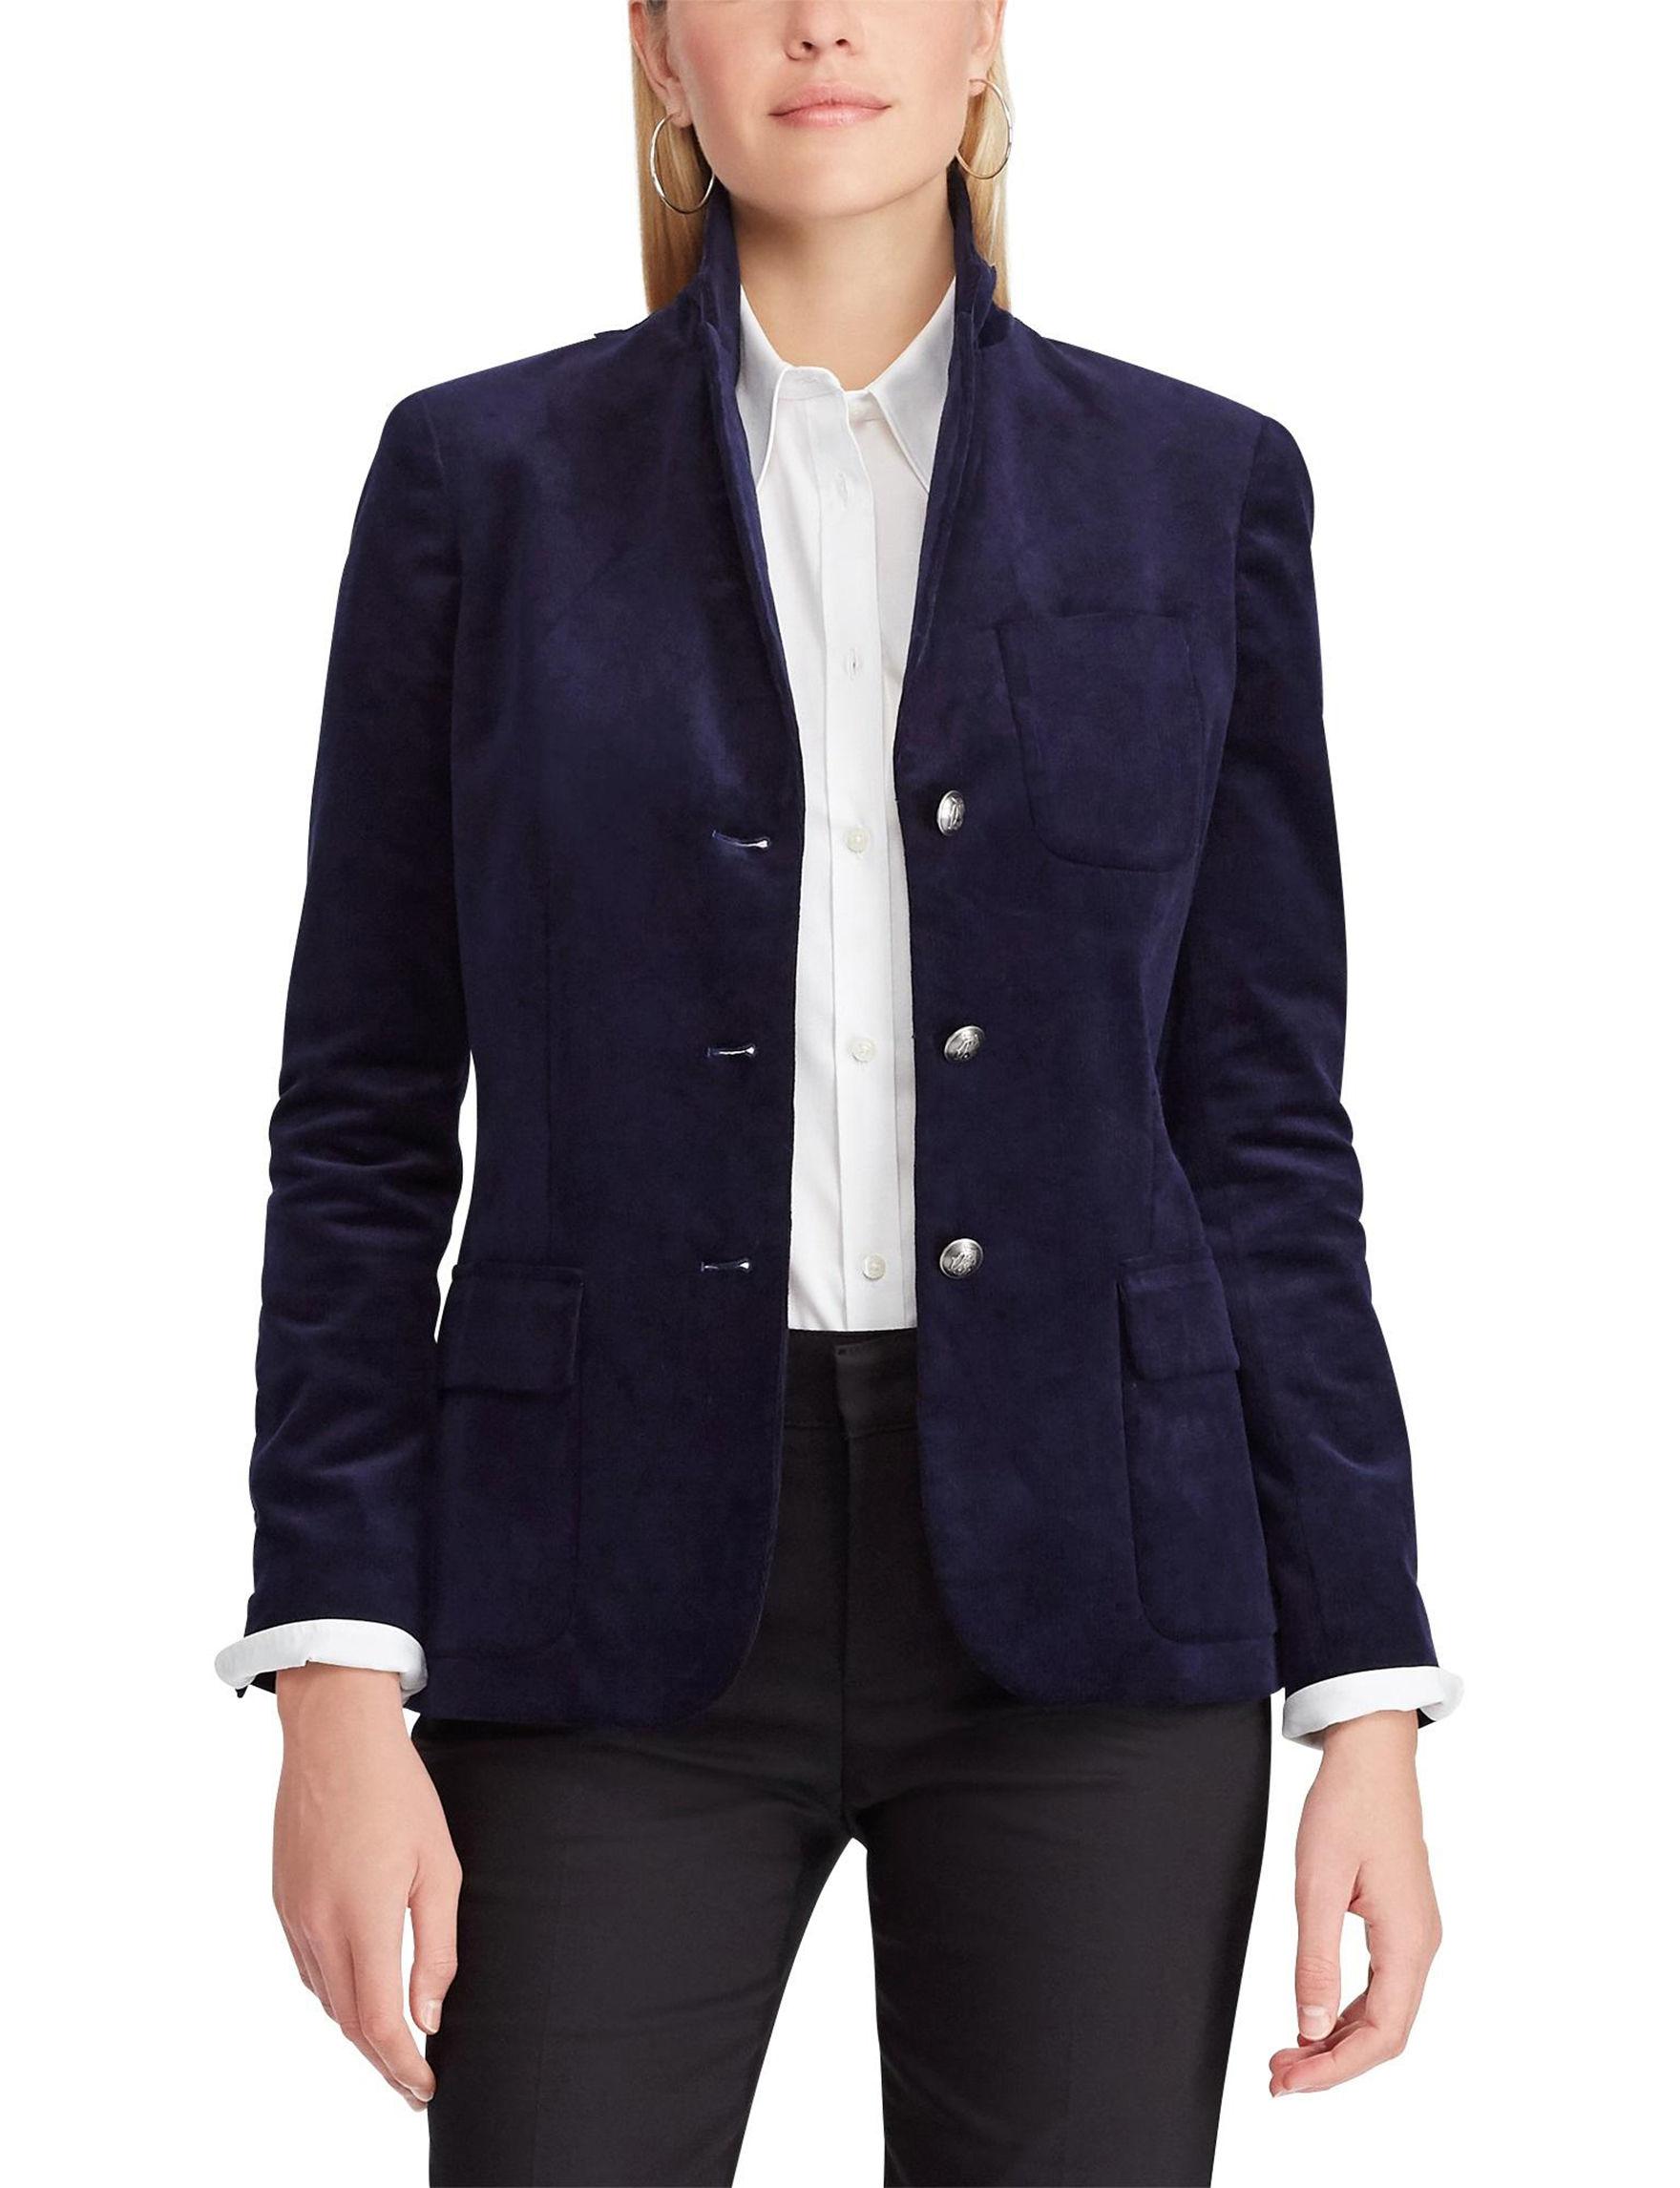 Chaps Navy Lightweight Jackets & Blazers